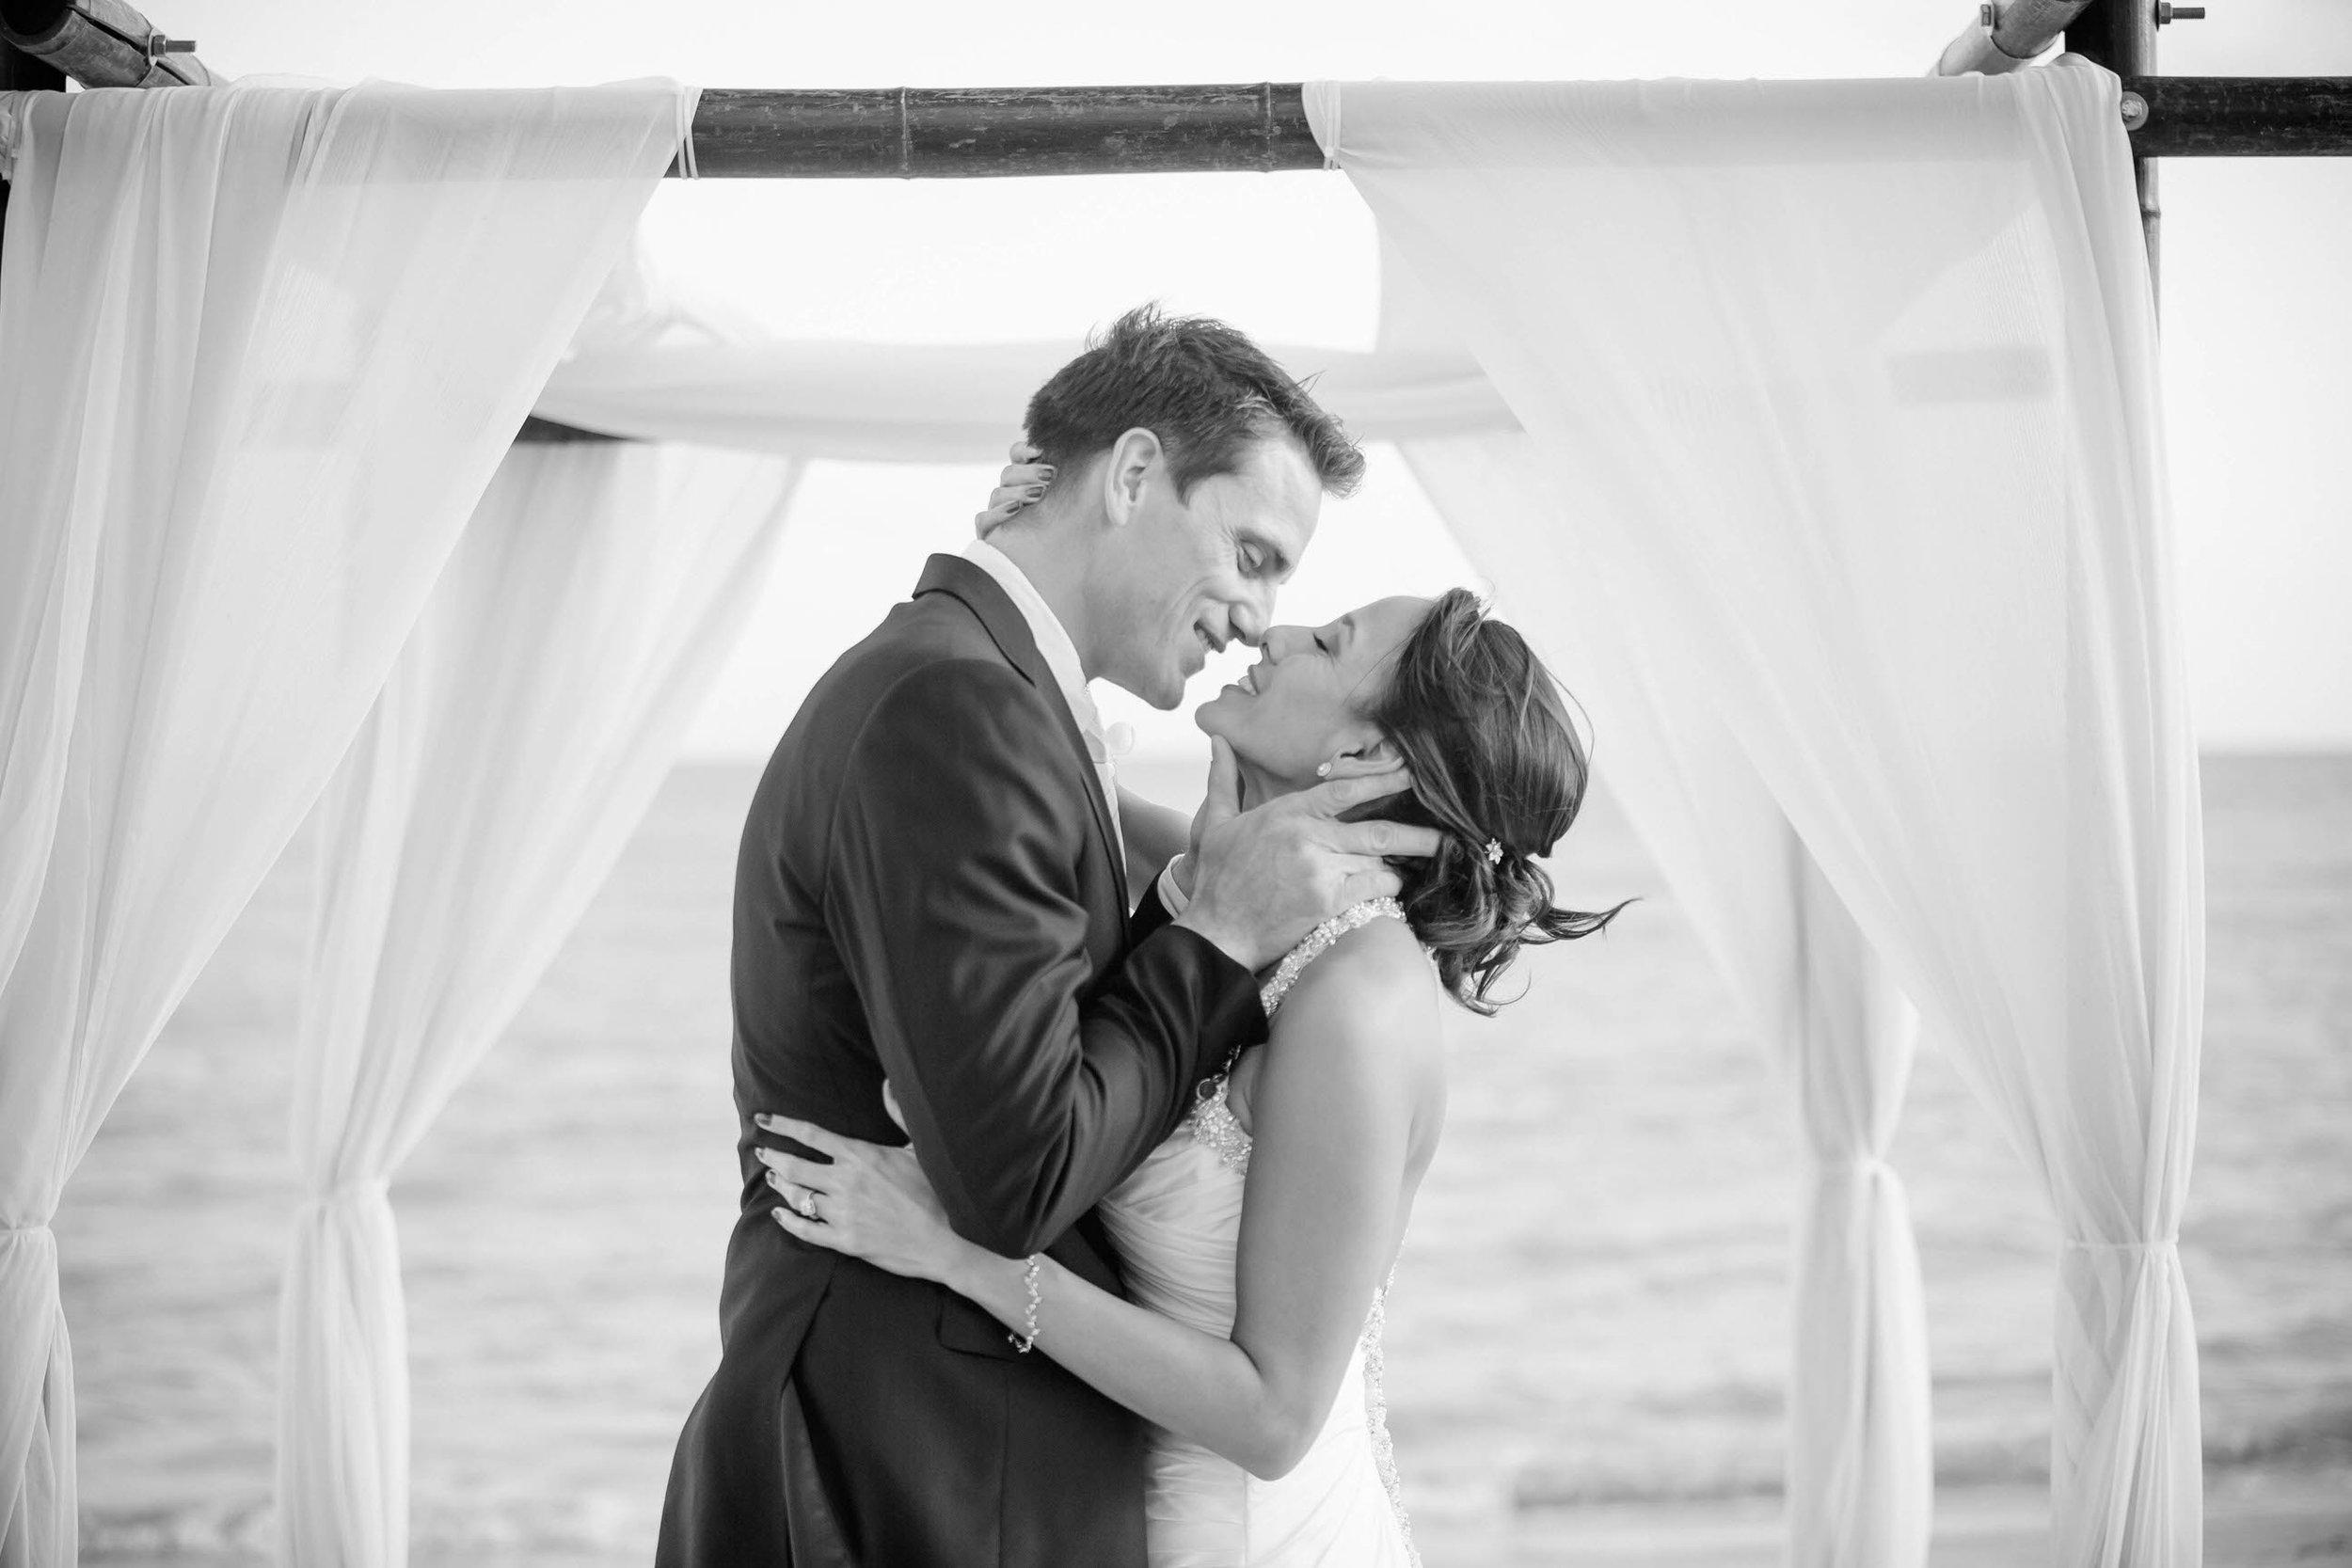 emotional_intimate_beach_wedding_tiny_house_photo.jpg